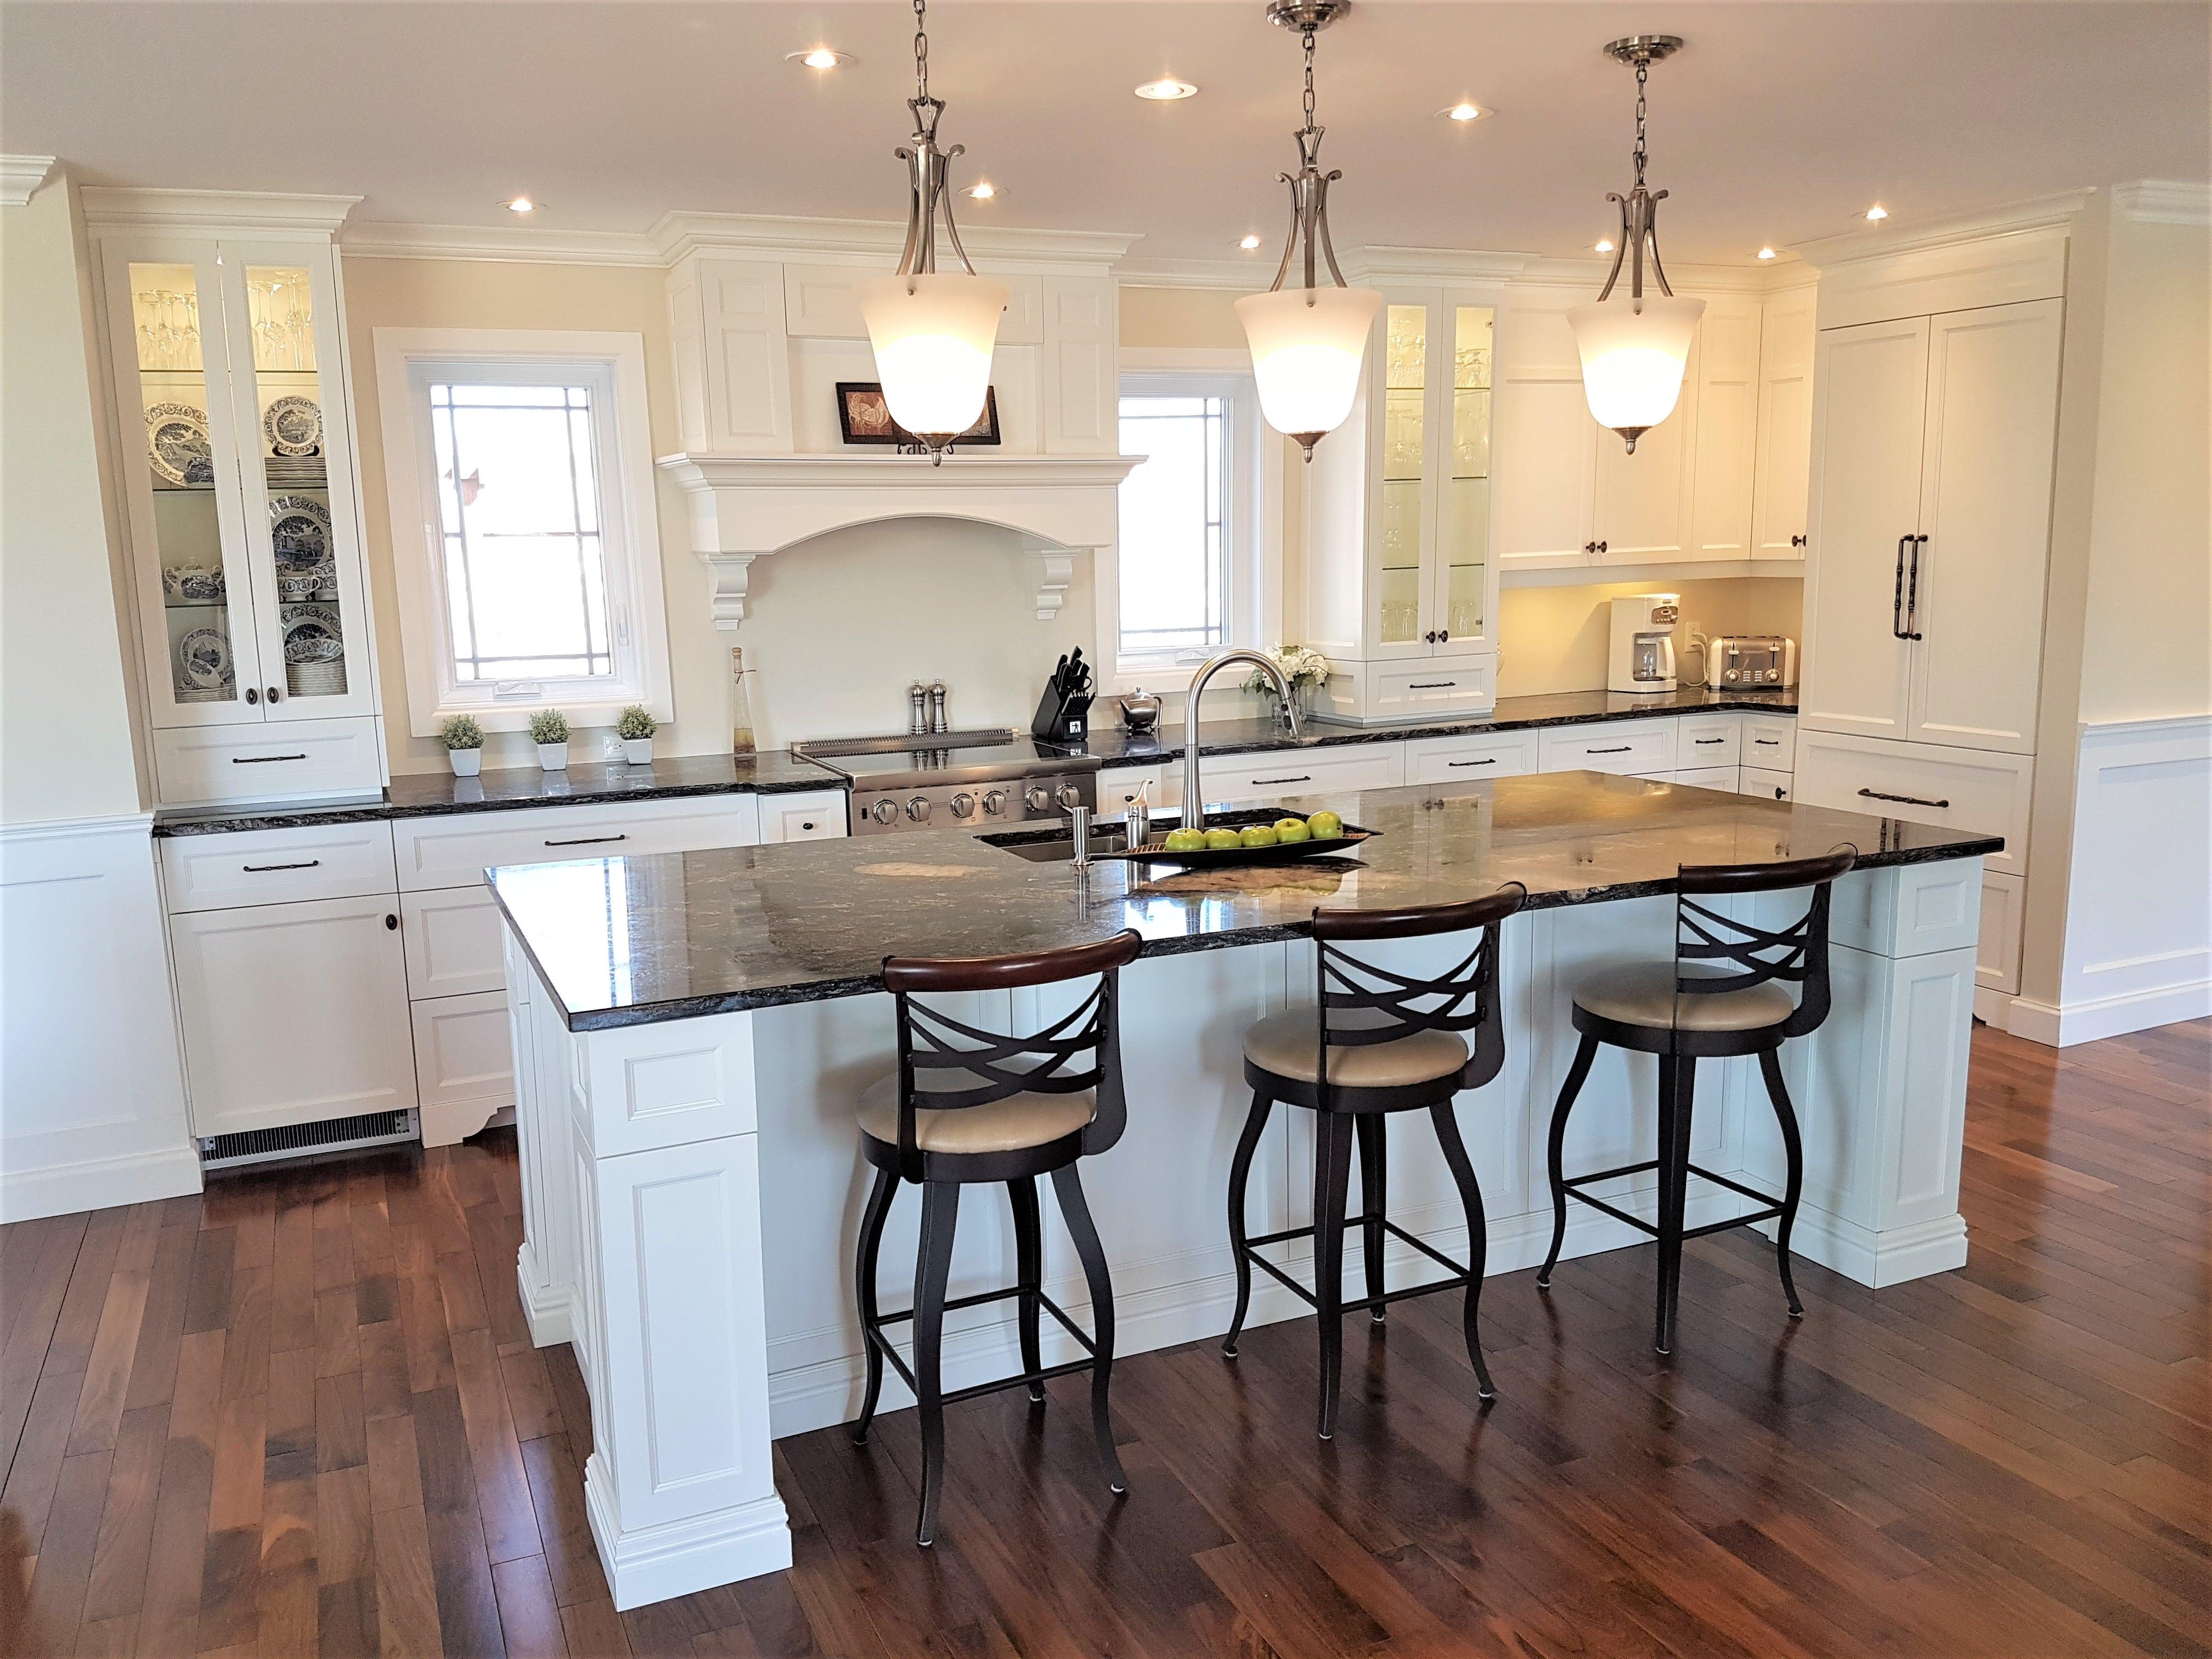 Comment Installer Un Comptoir De Cuisine comptoir de cuisine en bois